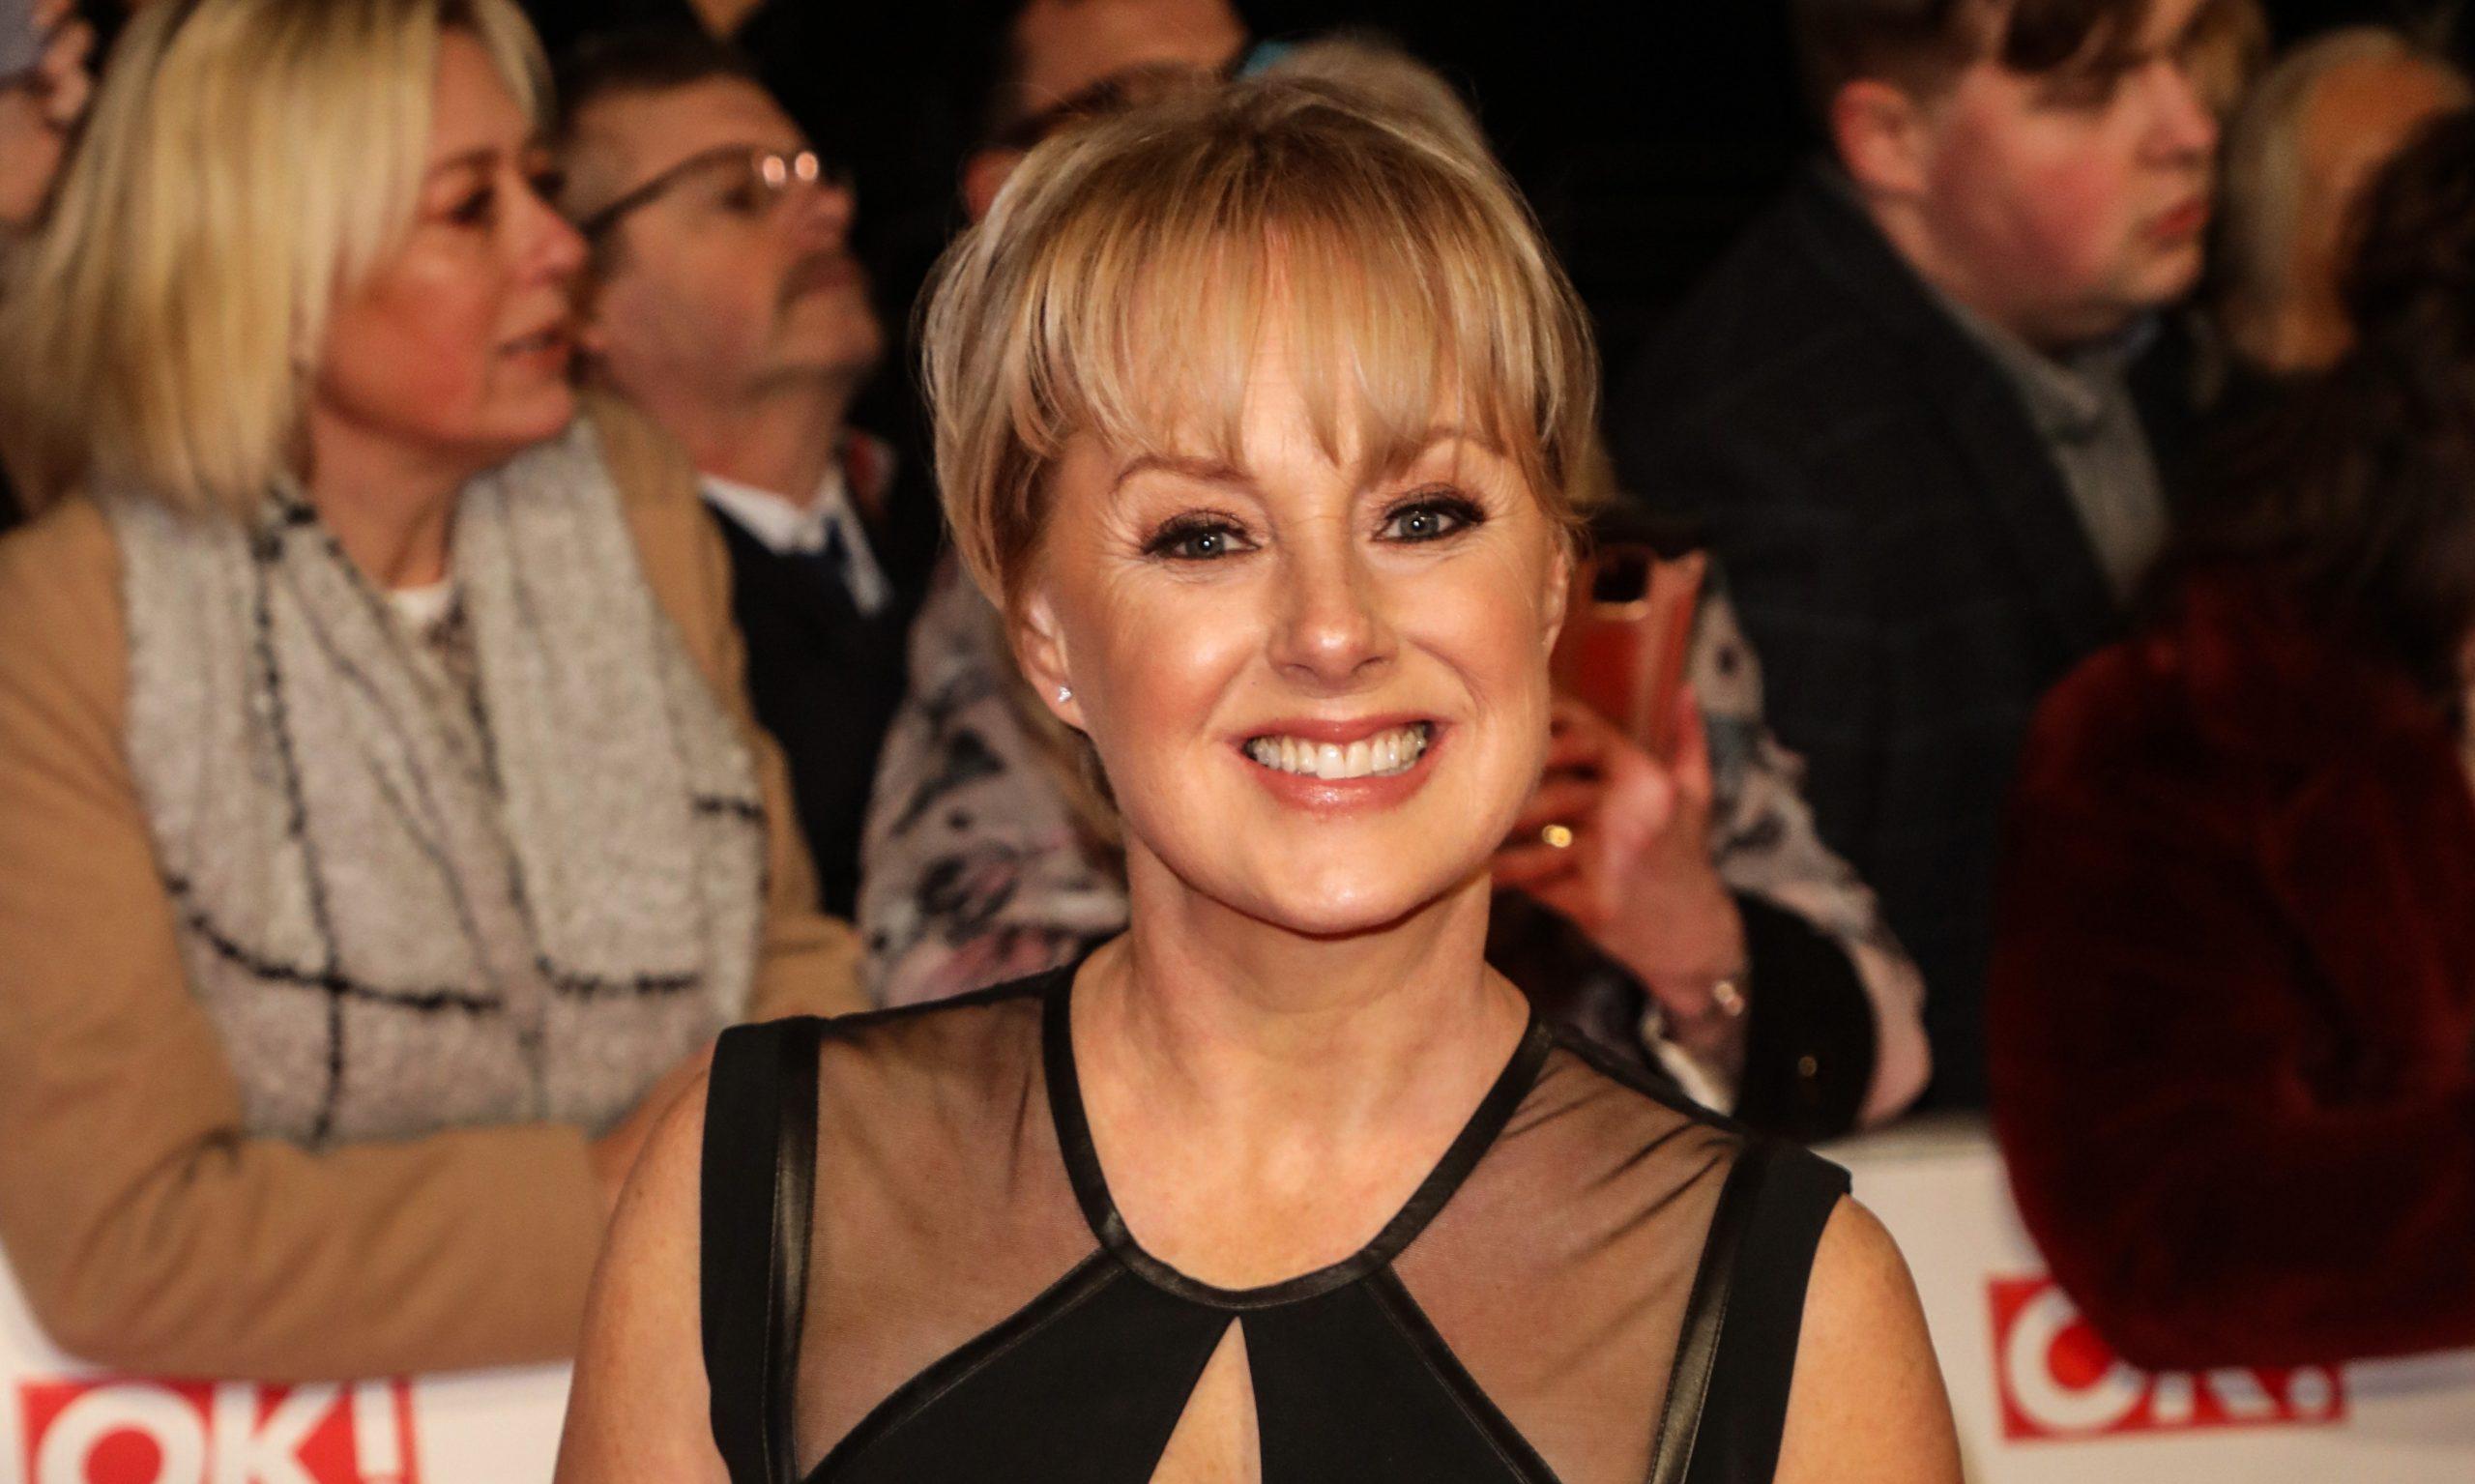 Coronation Street's Sally Dynevor confirms no cast or crew have coronavirus